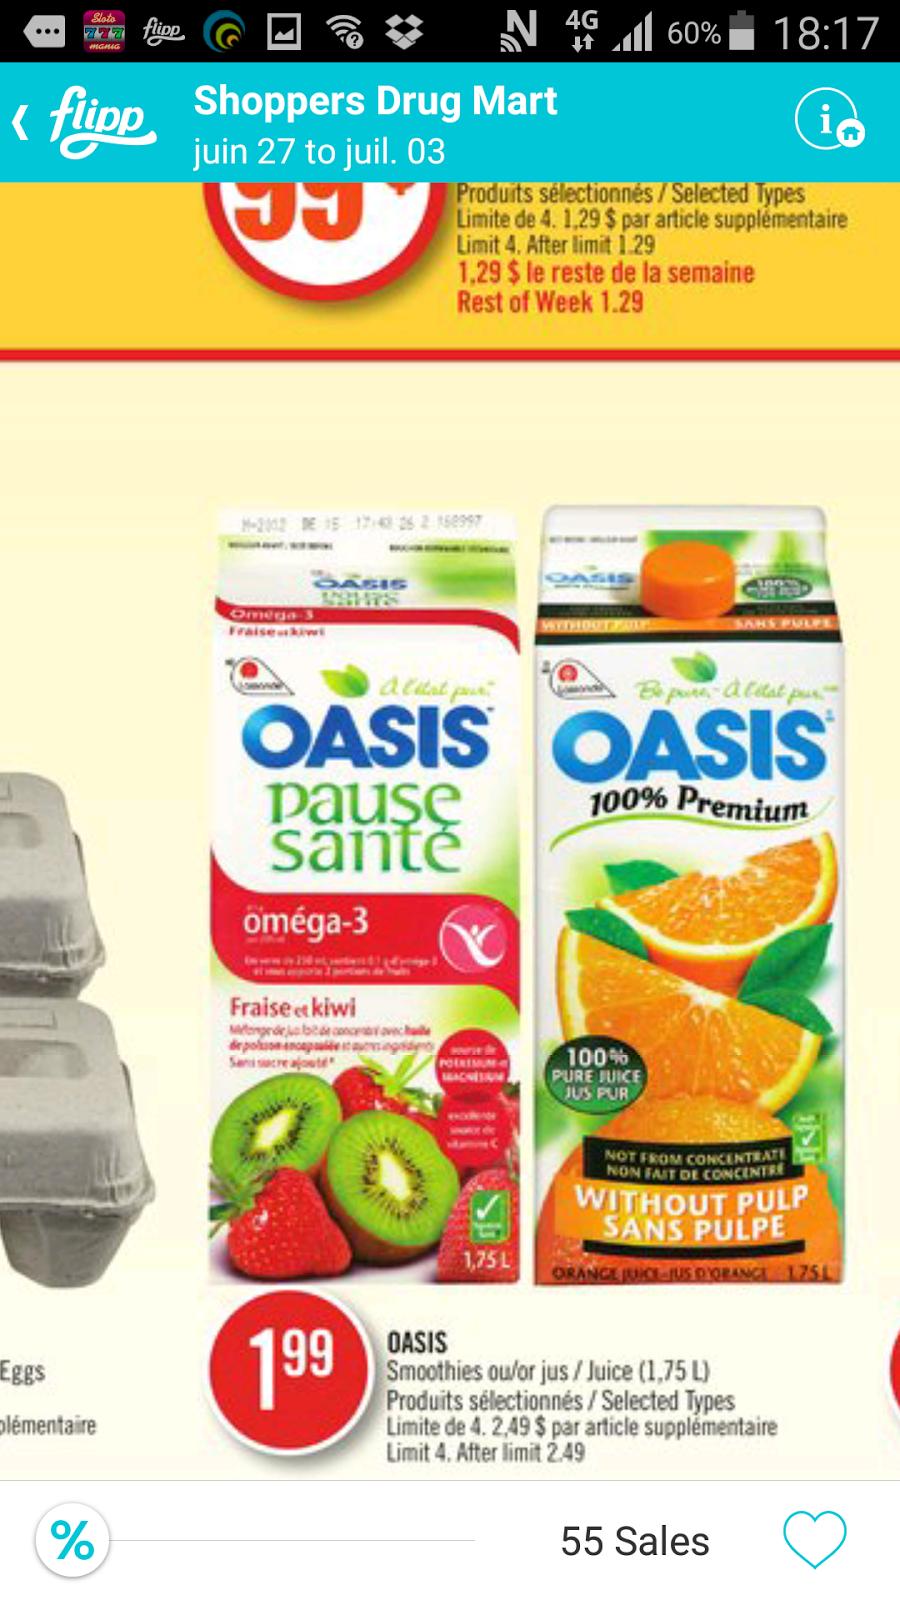 Oasis coupon code